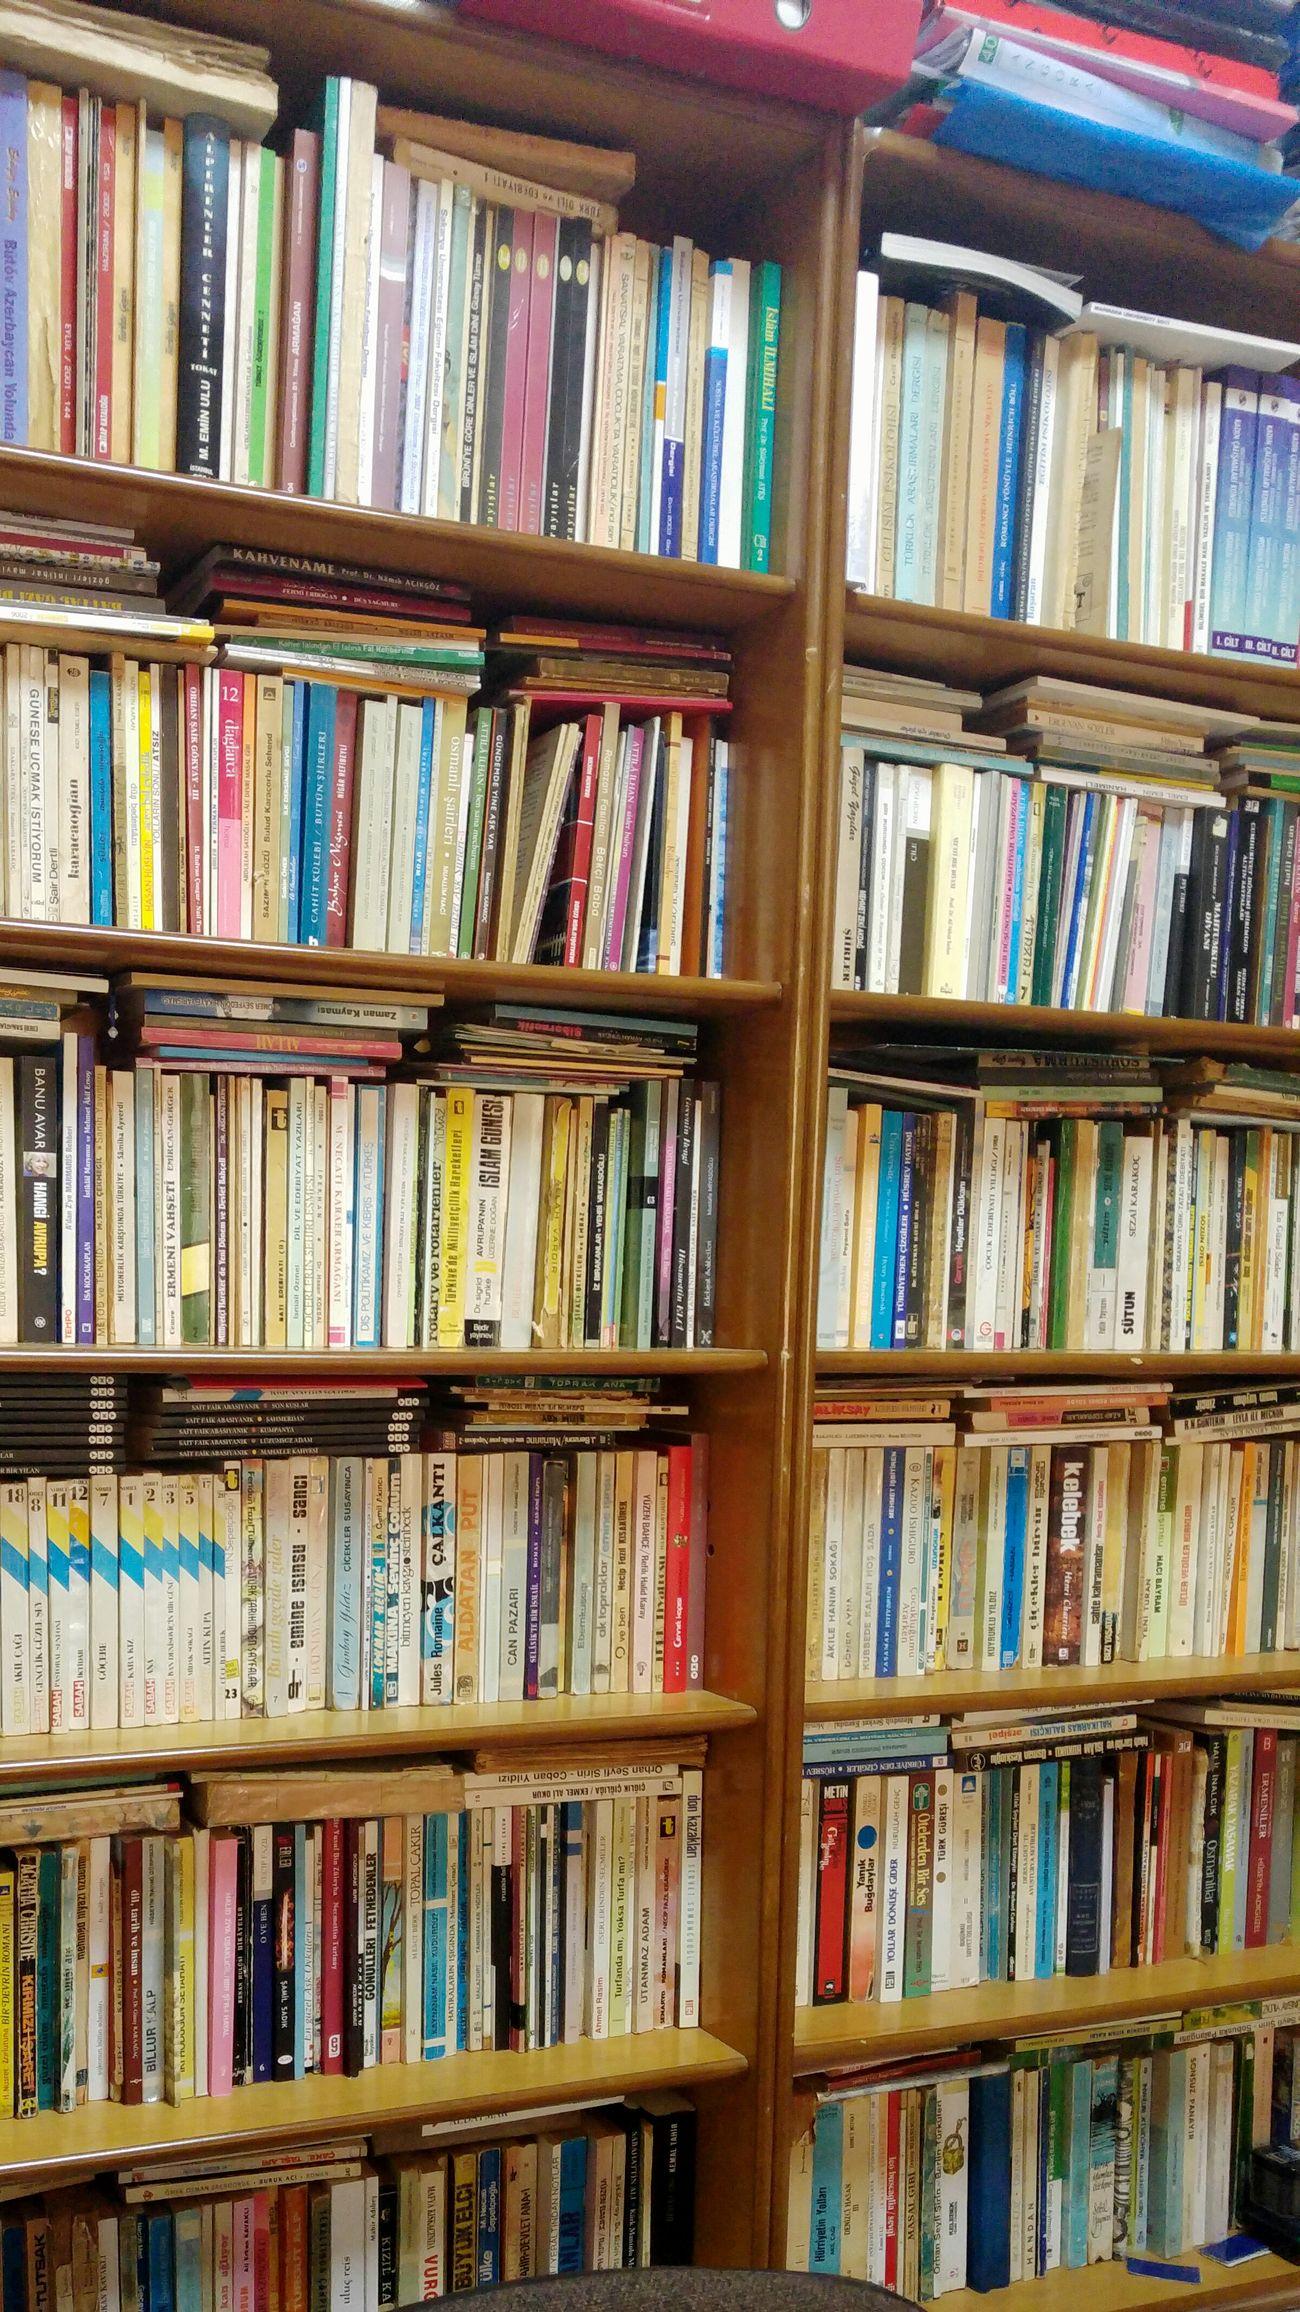 Beautifully Organized Books Books ♥ Book Collections Bookstagram Kitap Kitapkokusu Kitapsever Kitapaşkı